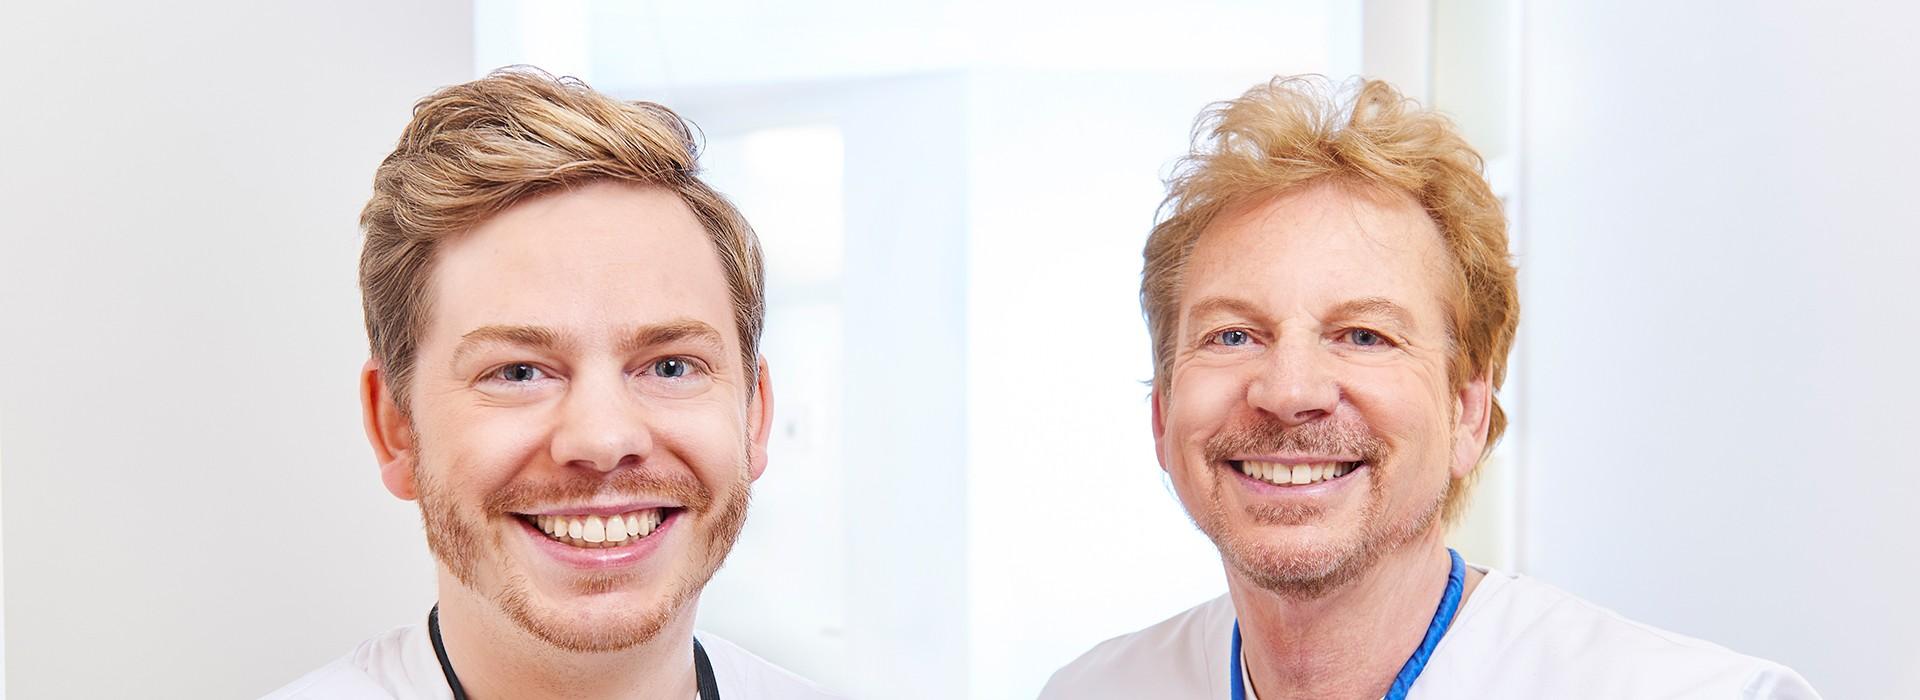 Zahnärzte aus Ibbenbüren Lünenbürger